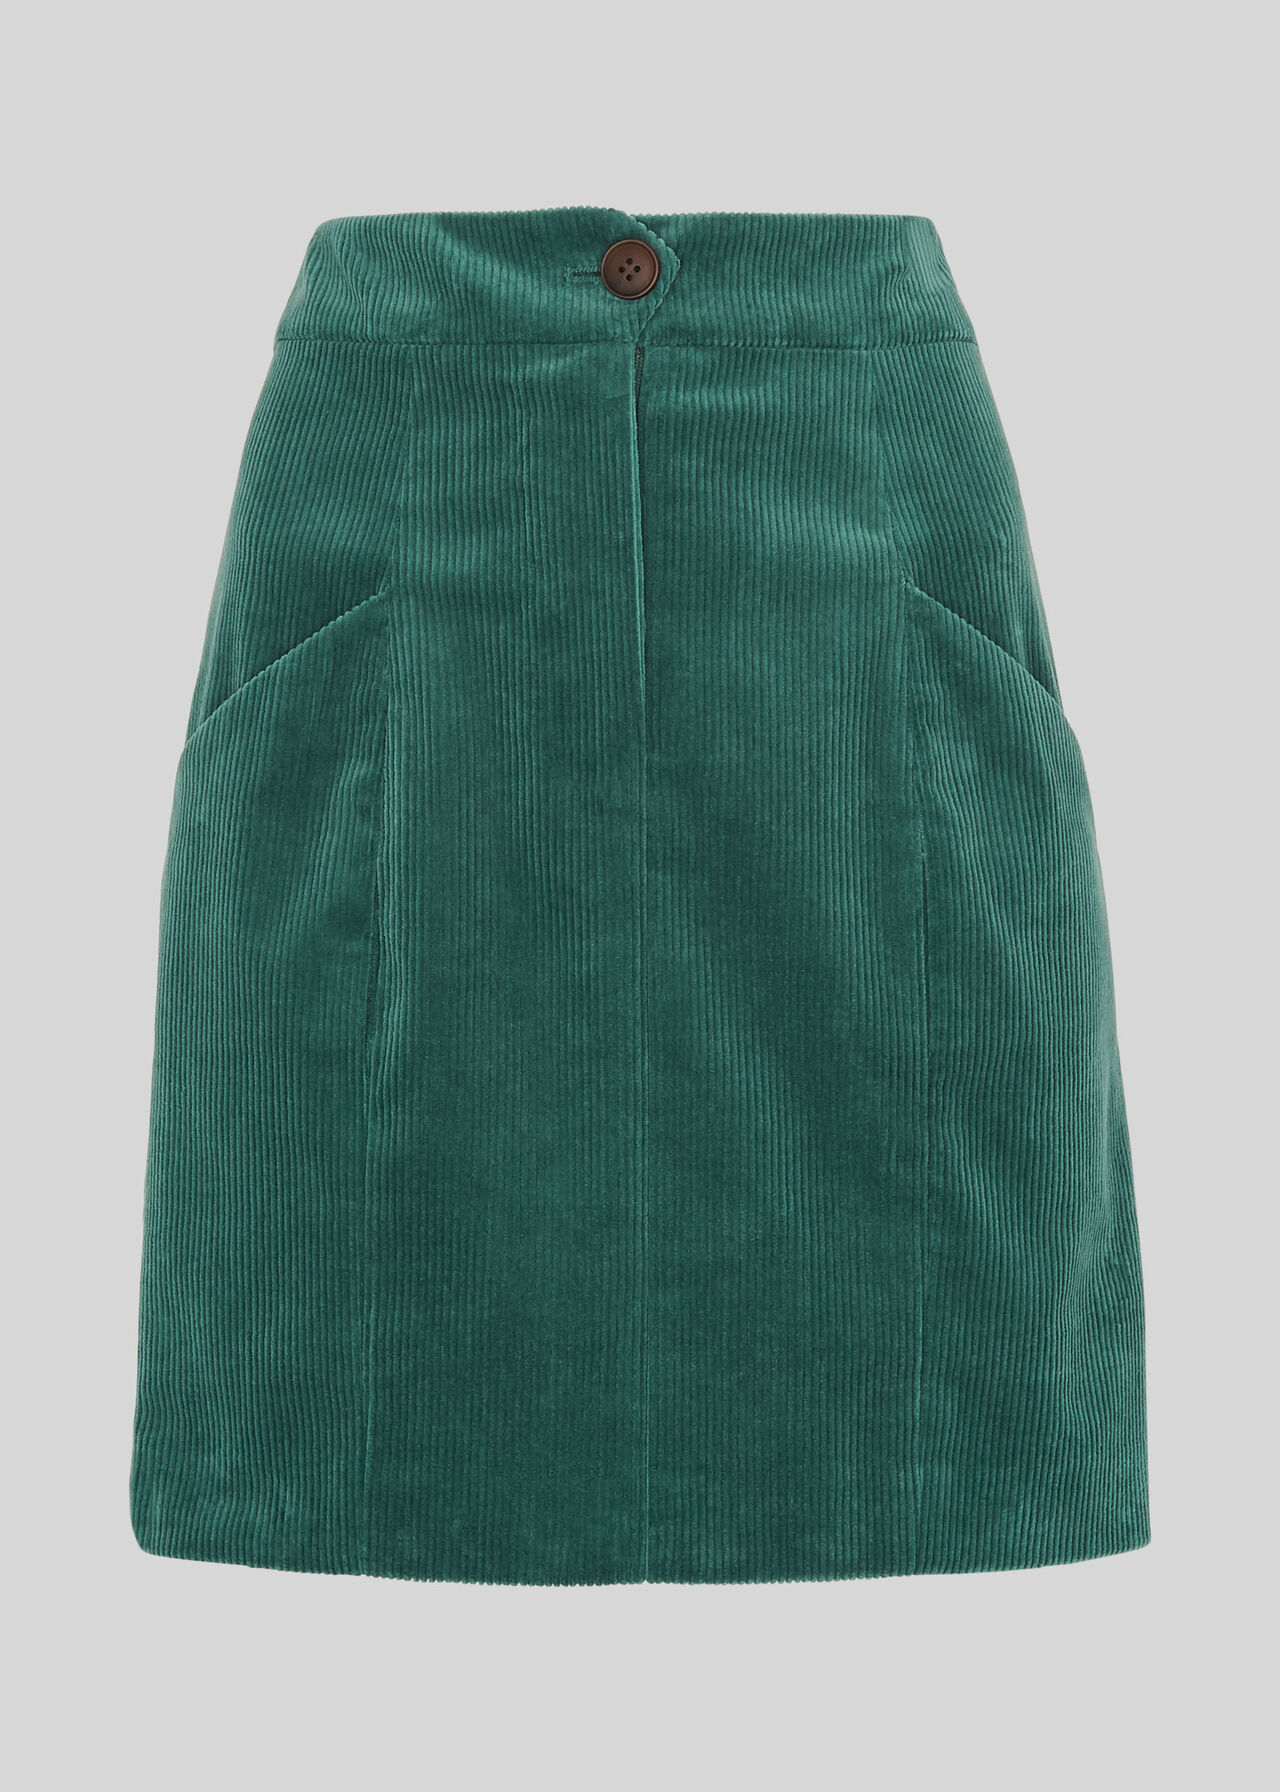 Billie Cord Skirt Sage Green